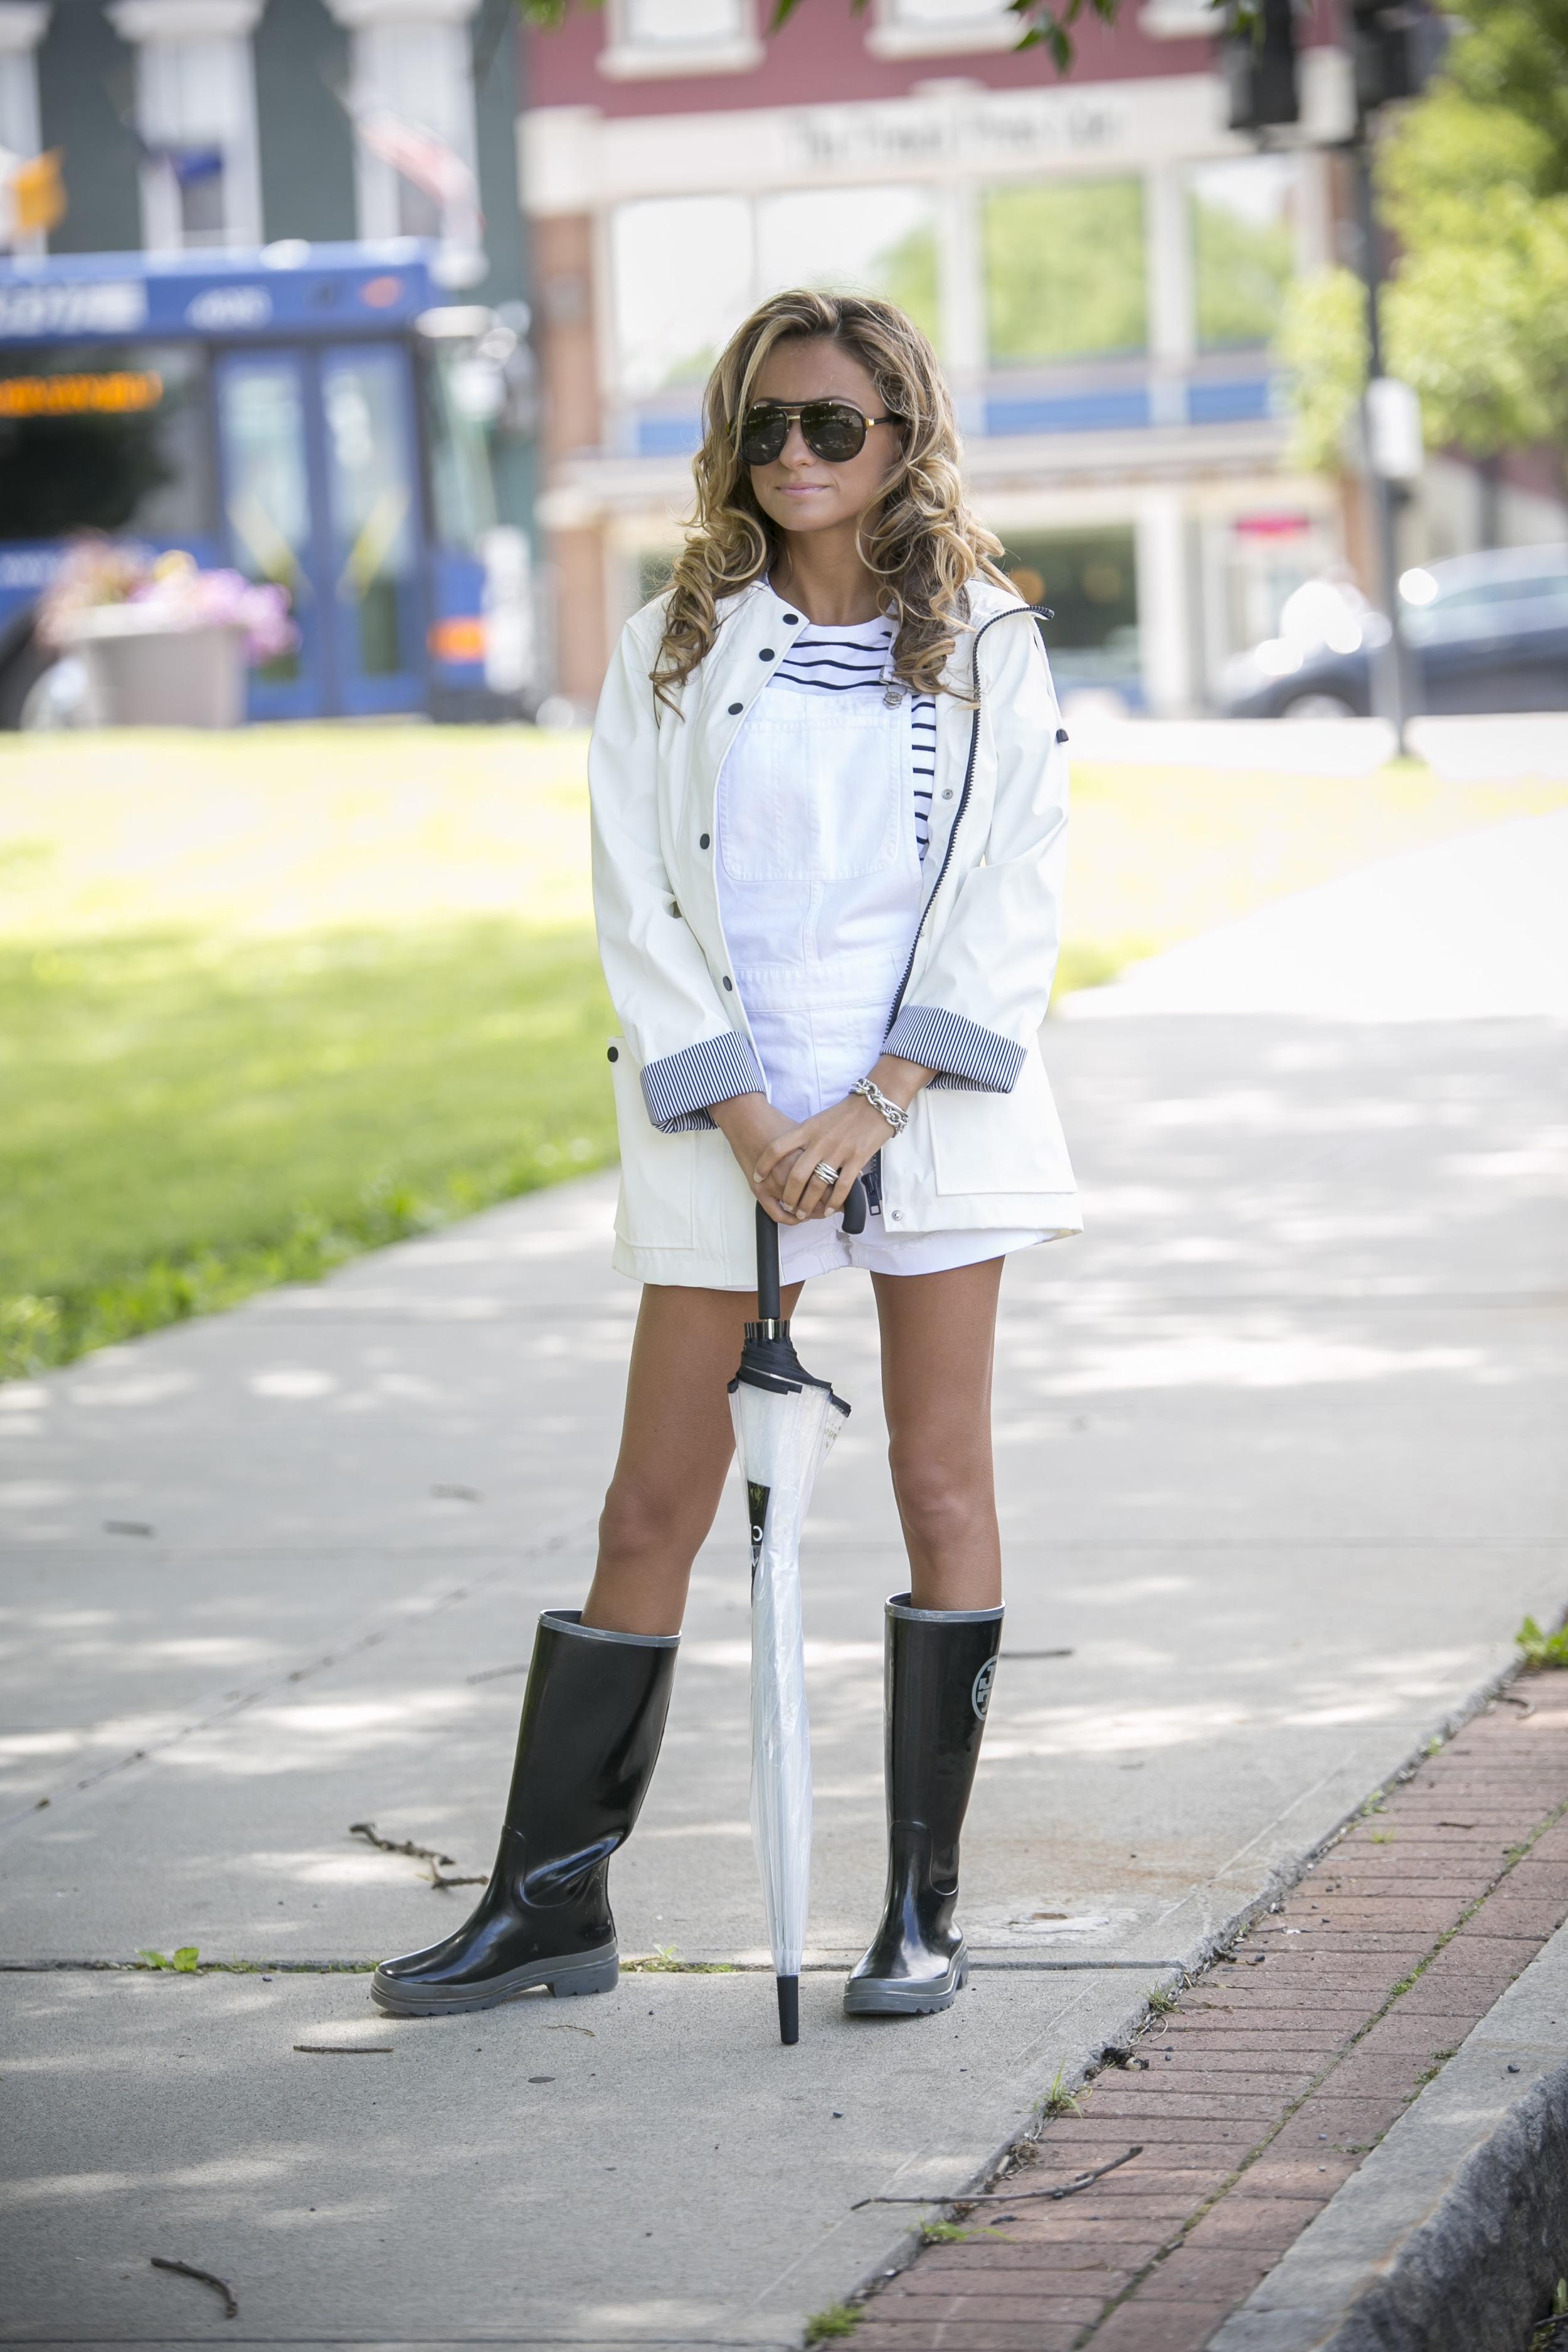 rainy day attire from streetstyle fashion blog north of Manhattan